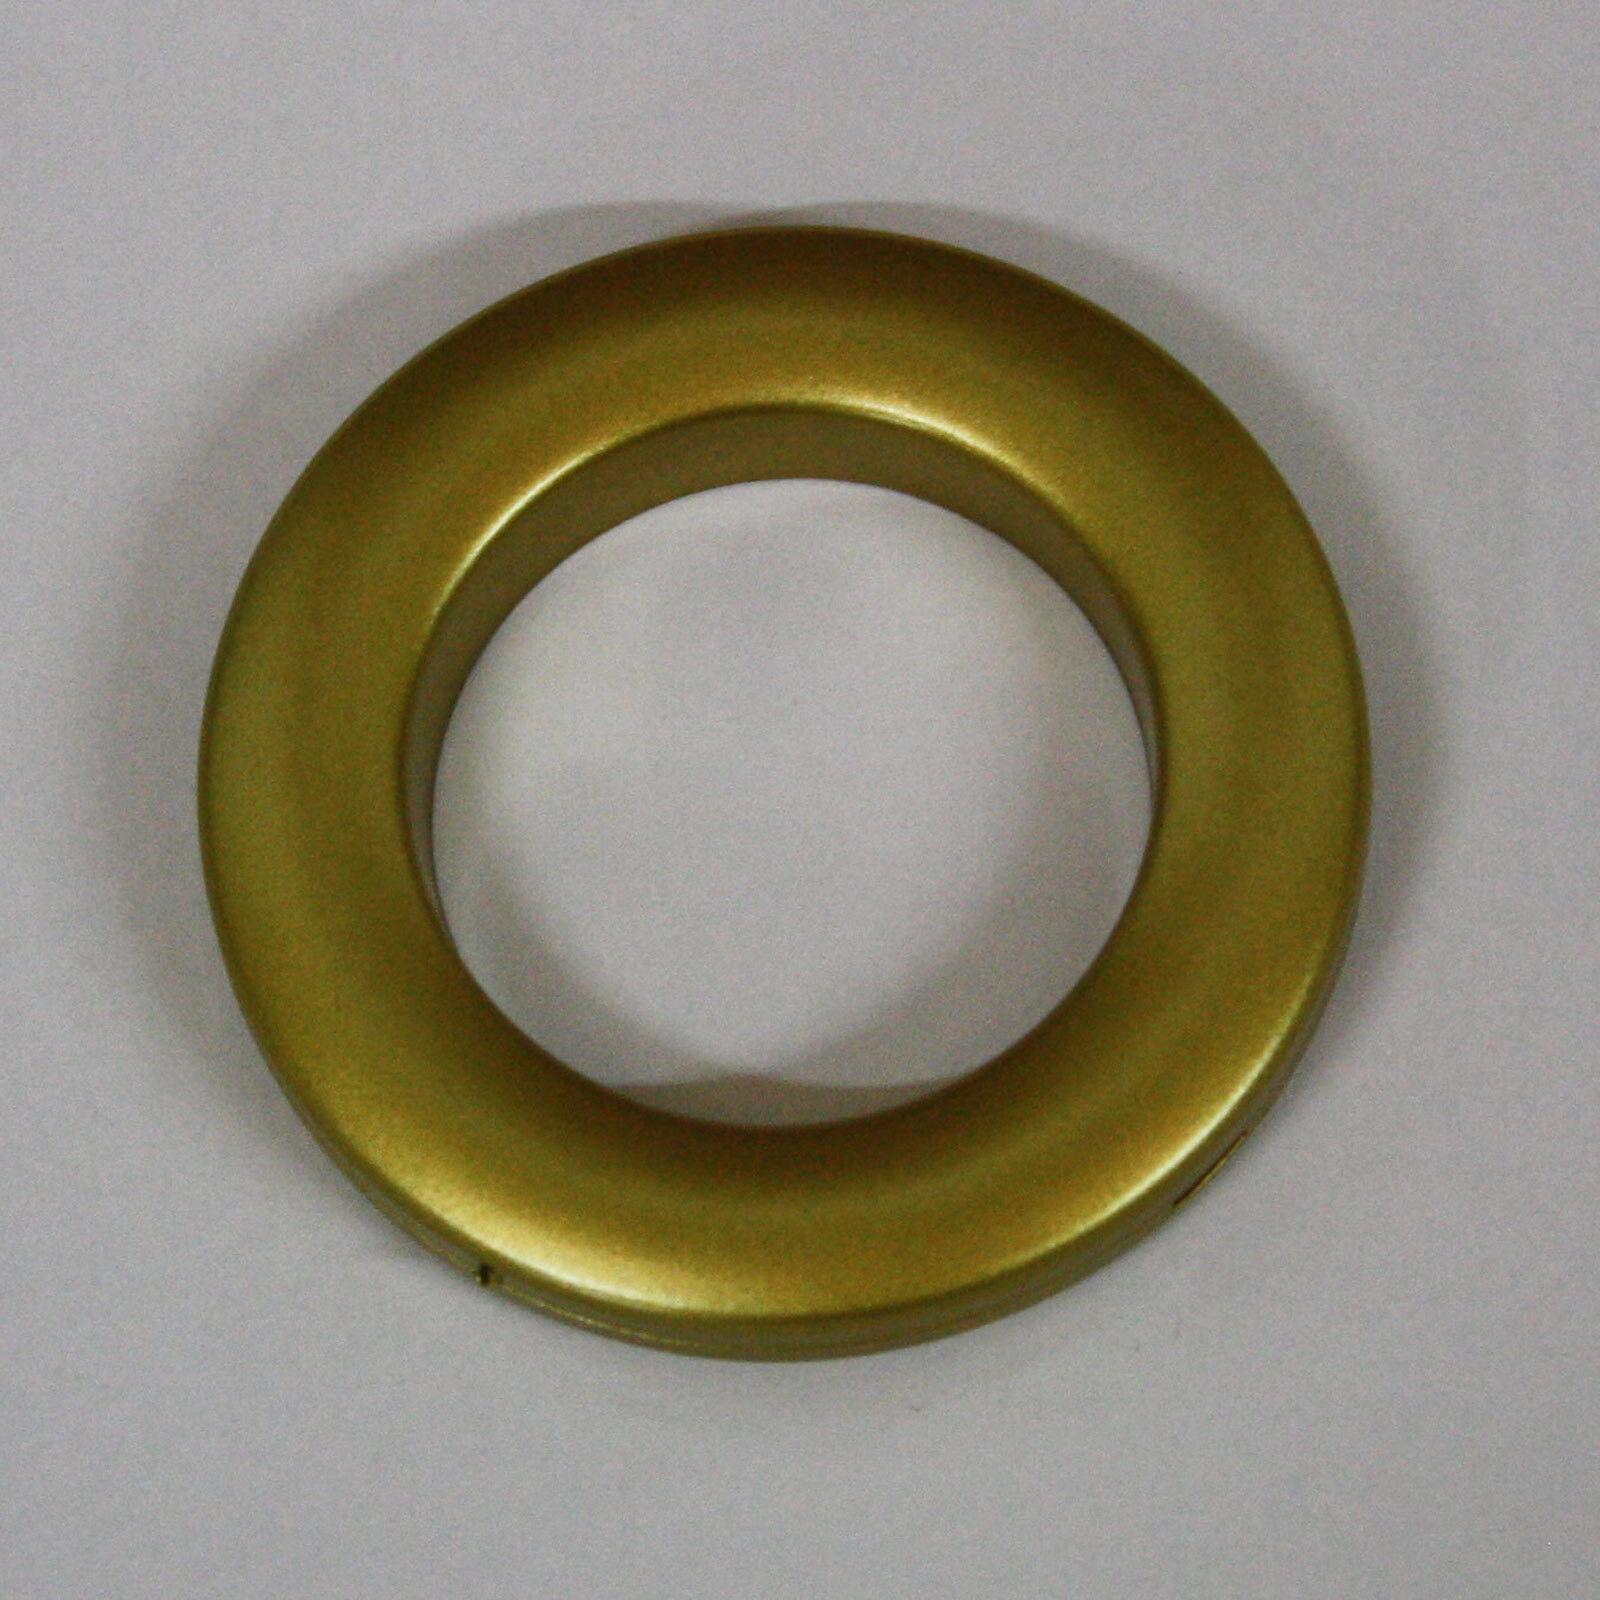 Curtain Eyelet Eyelet Eyelet Rings - Matt Gold Colour cd6b71